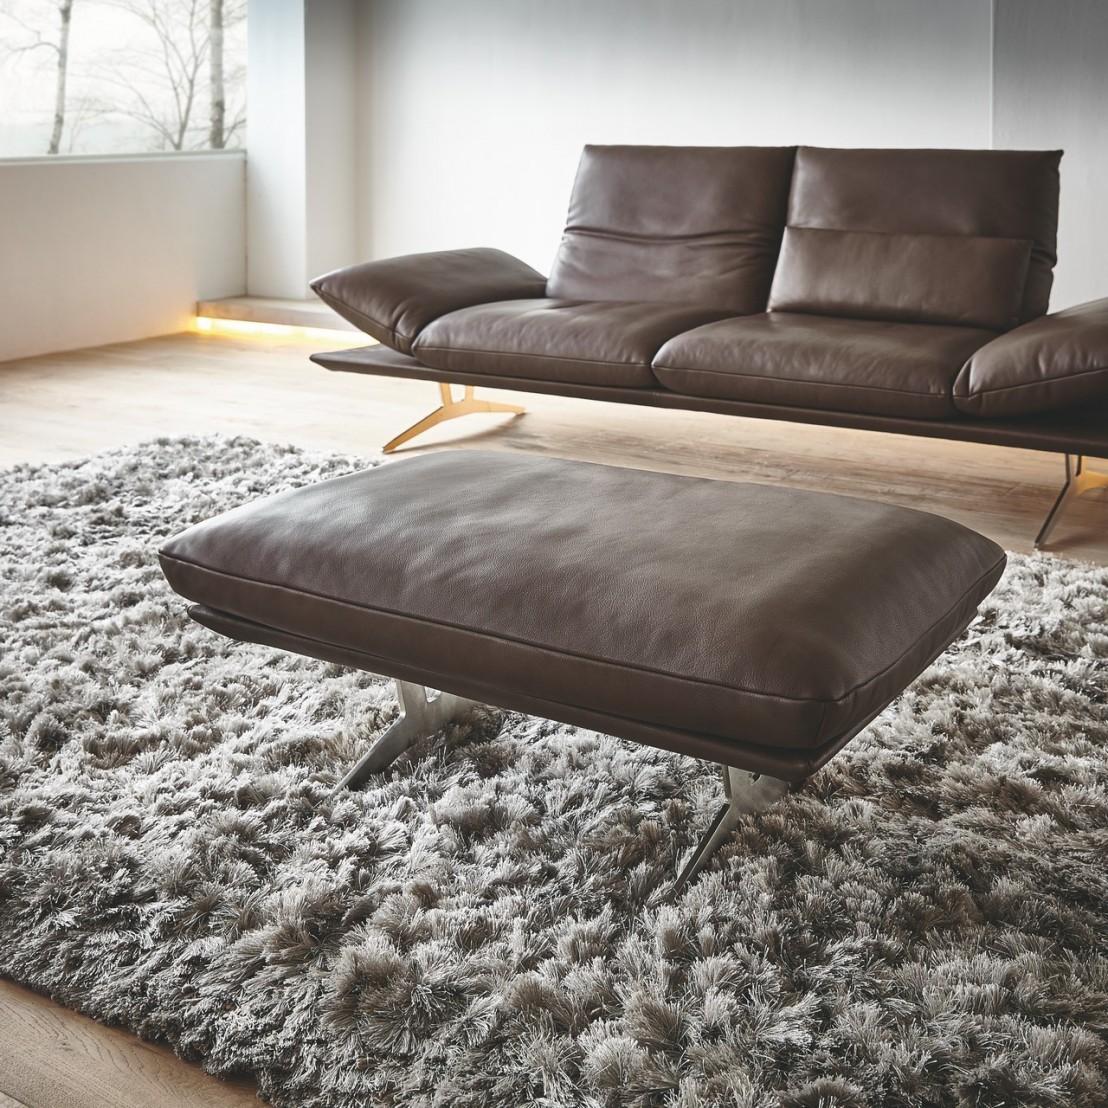 Canap ultra design ad senso 2 places cuir ou tissu - Canape 2 places design ...